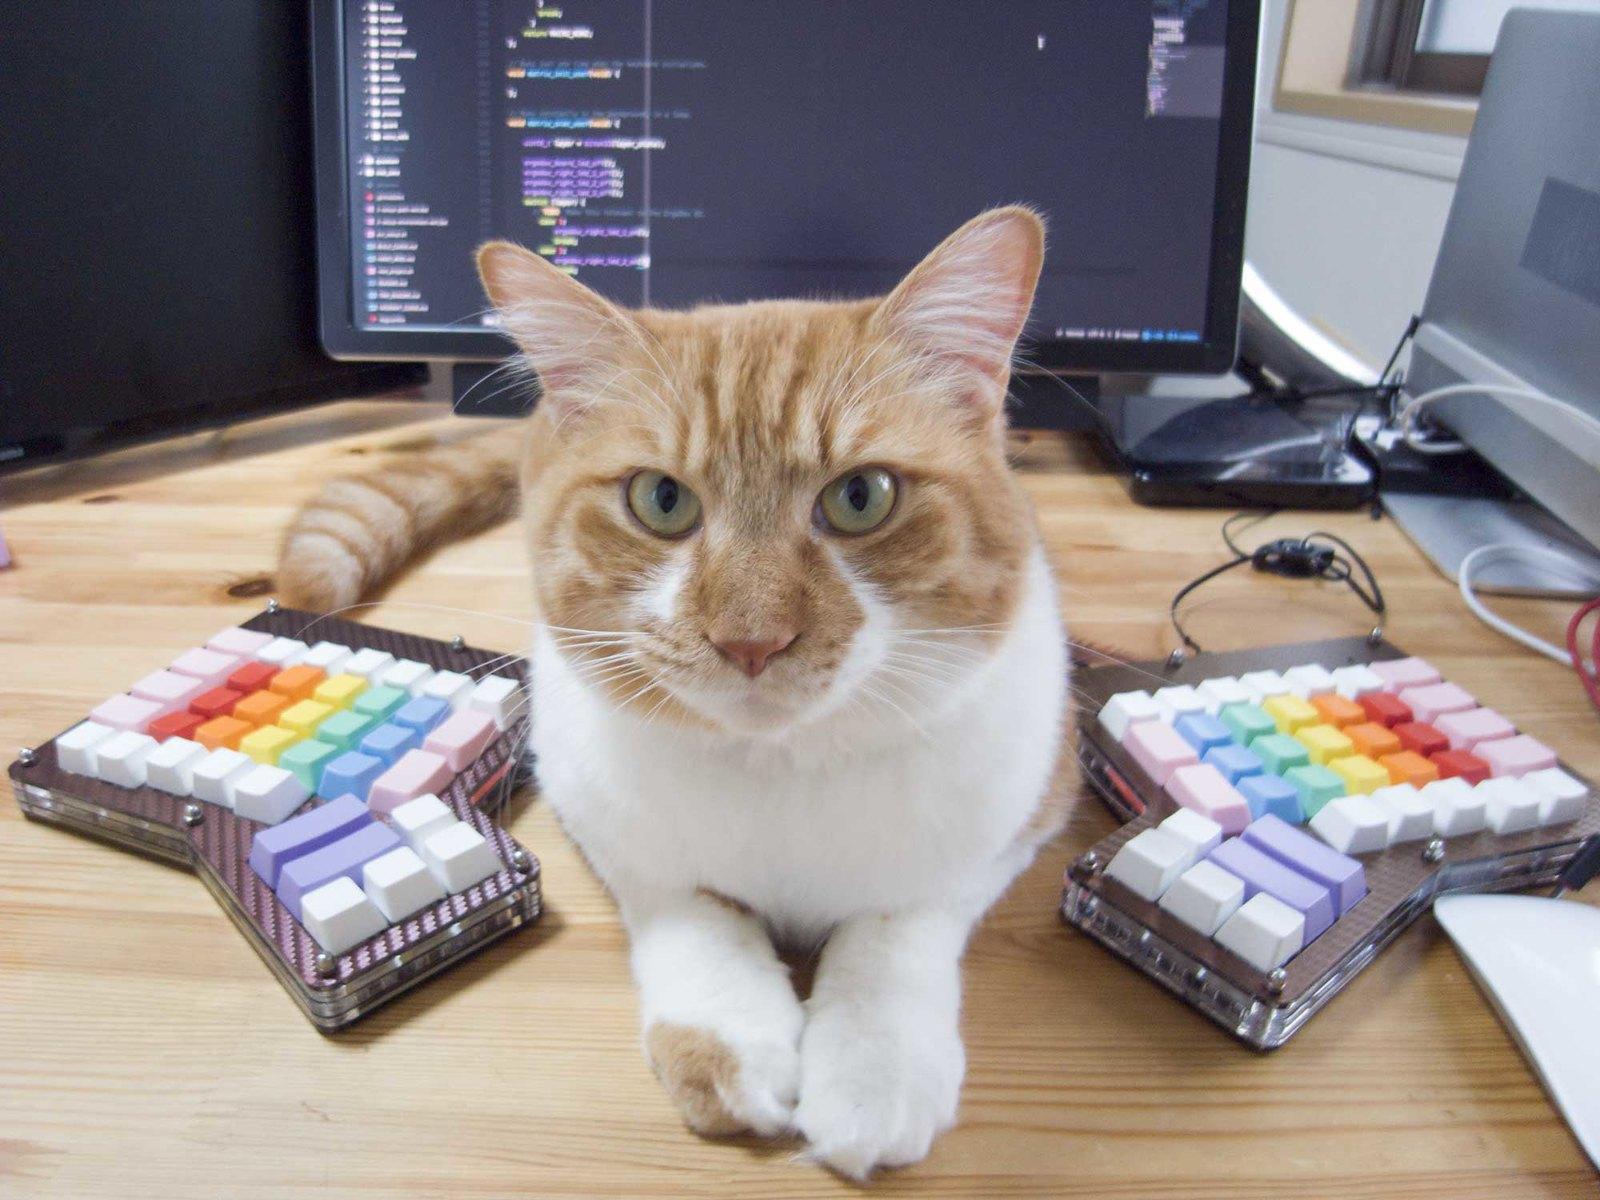 ErgoDox with Cat